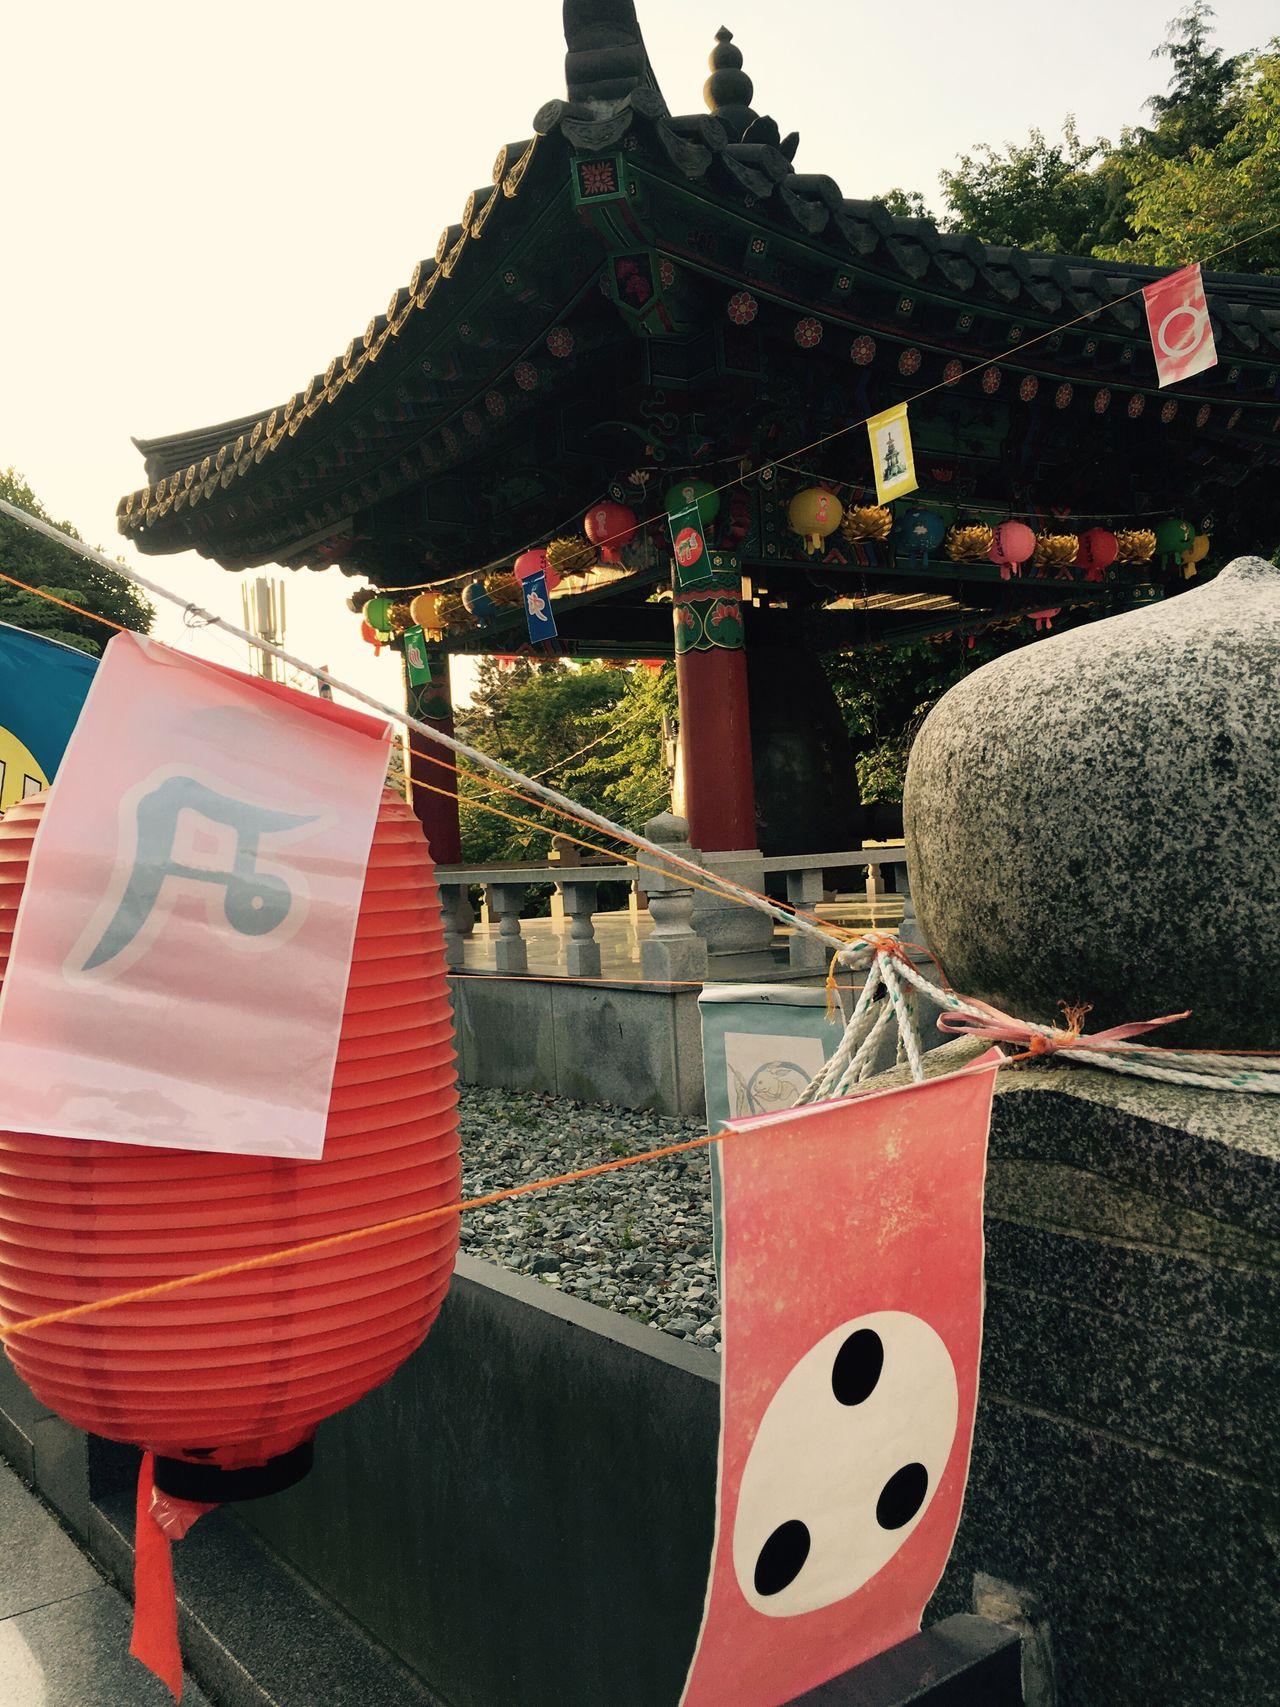 The Day Of Buddha's Coming Temple Korea Geojedo Morning Relegion